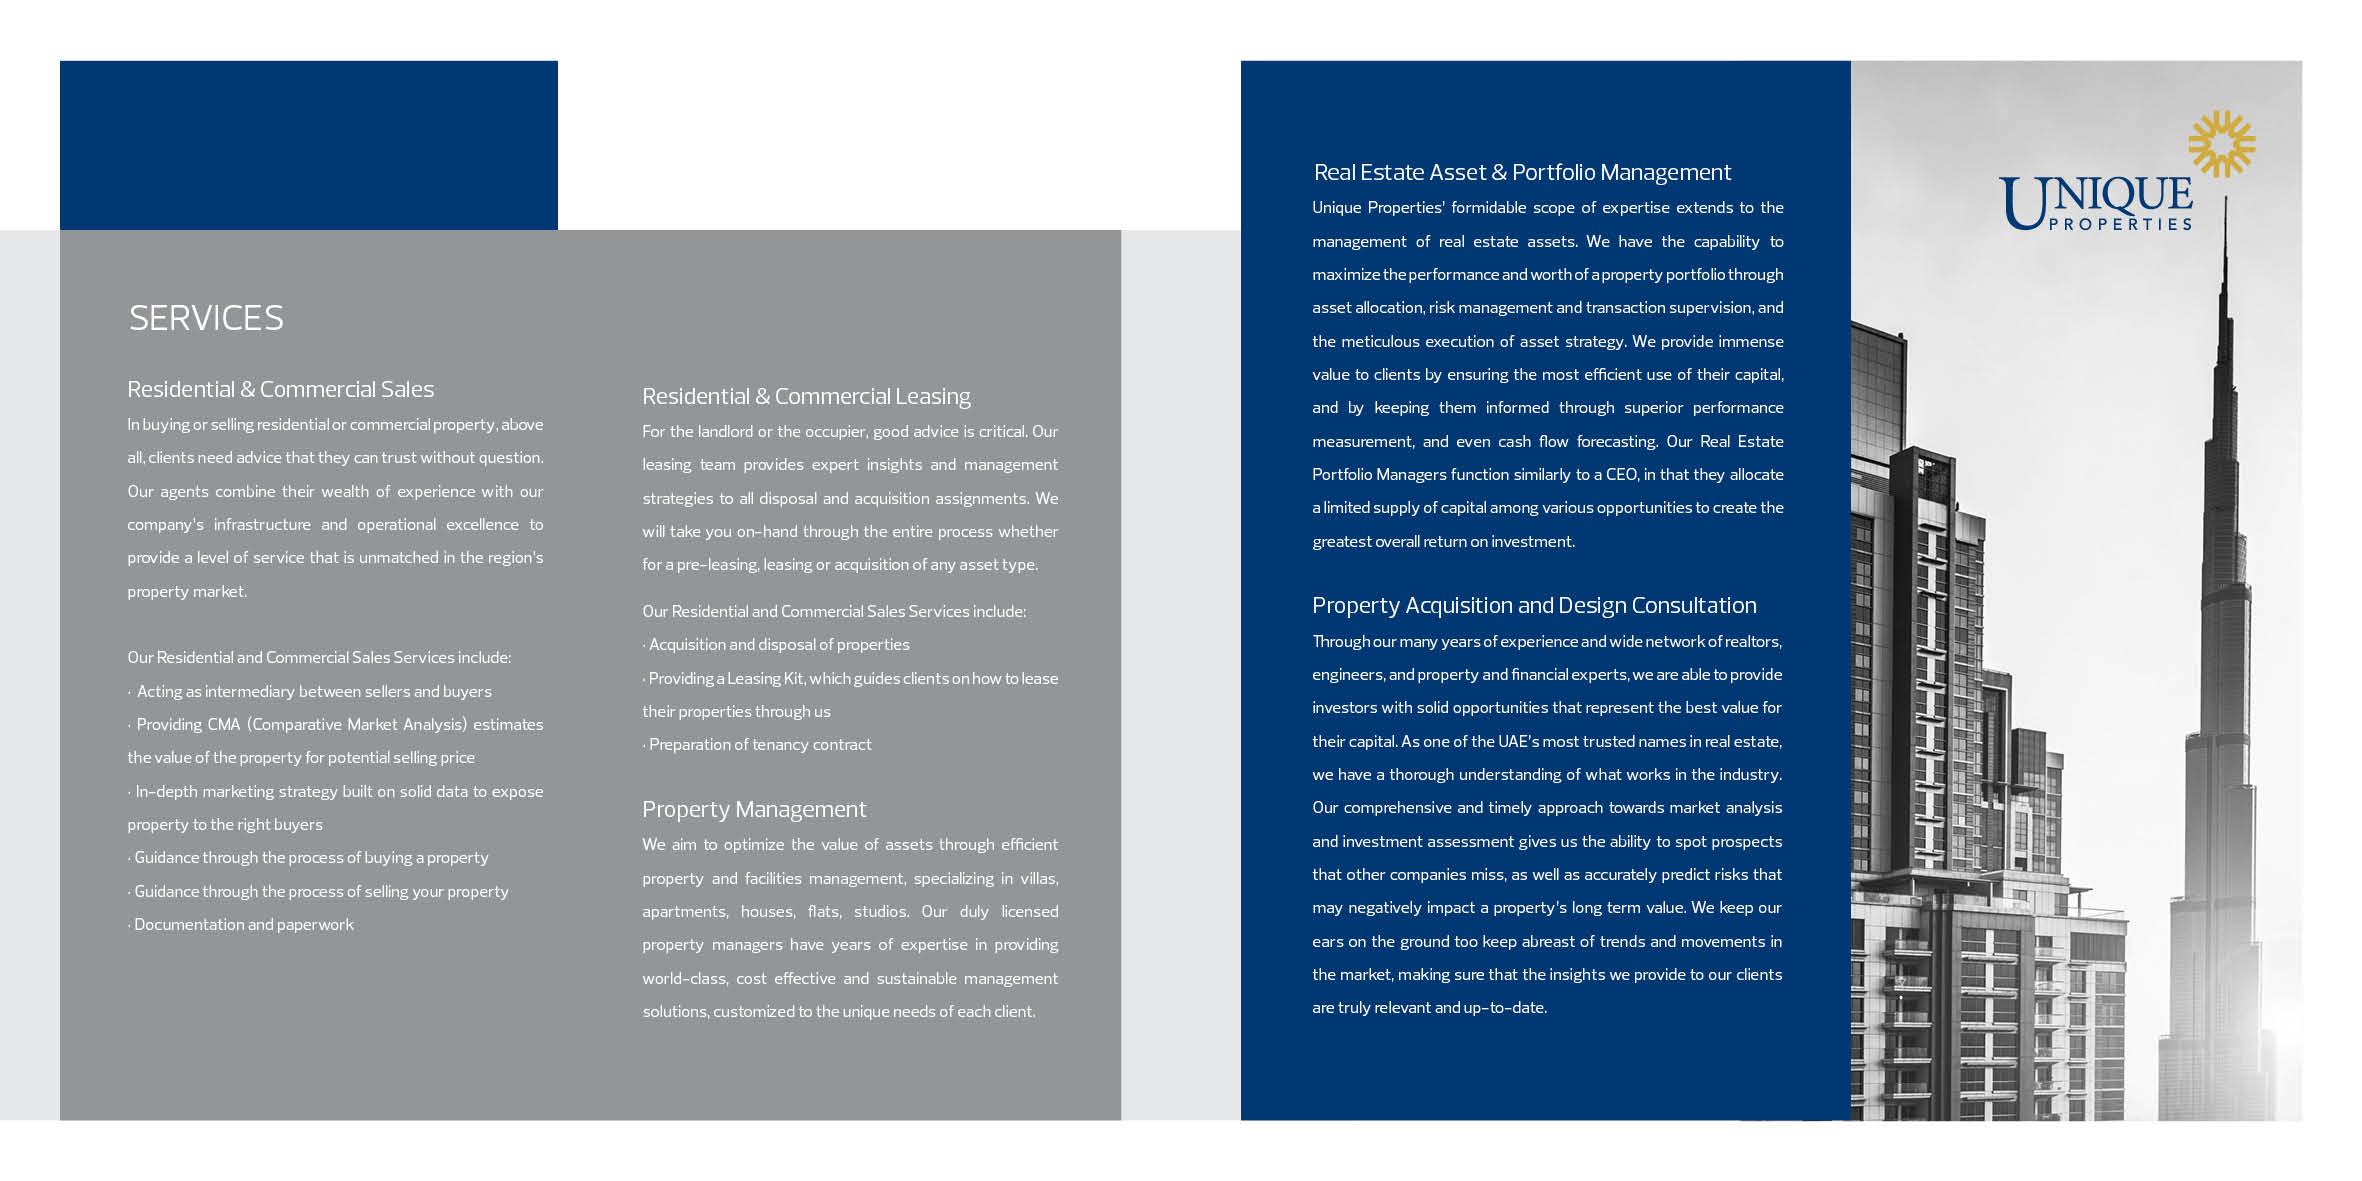 Unique Properties_Inside pages6.jpg